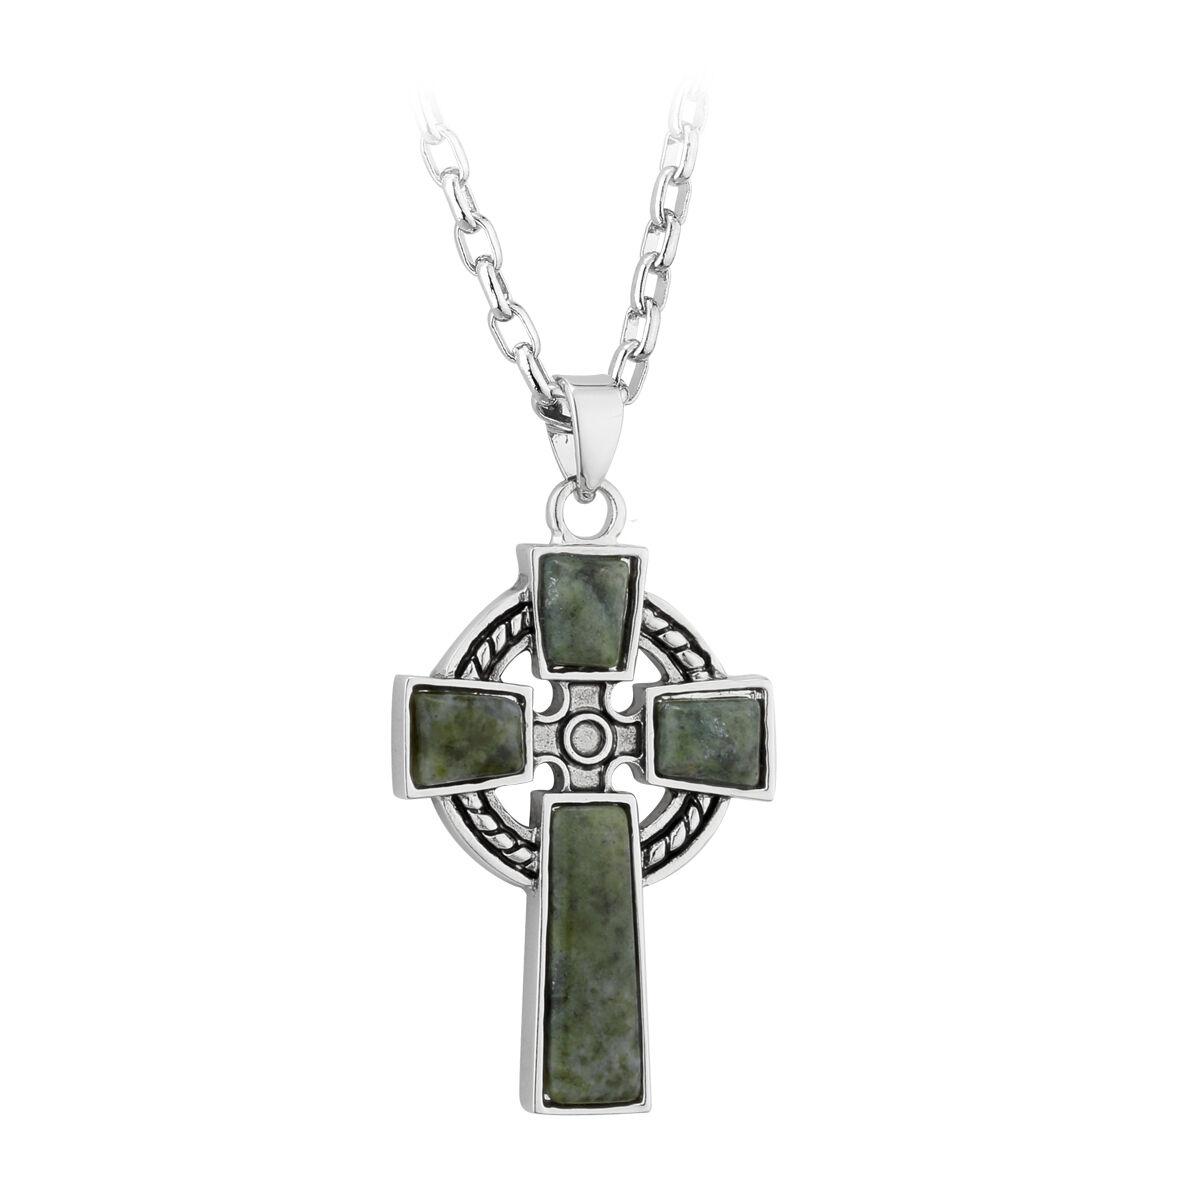 Shamrock Cross Kette Keltisches Kreuz irischer Schmuck aus Silber /& Kristall